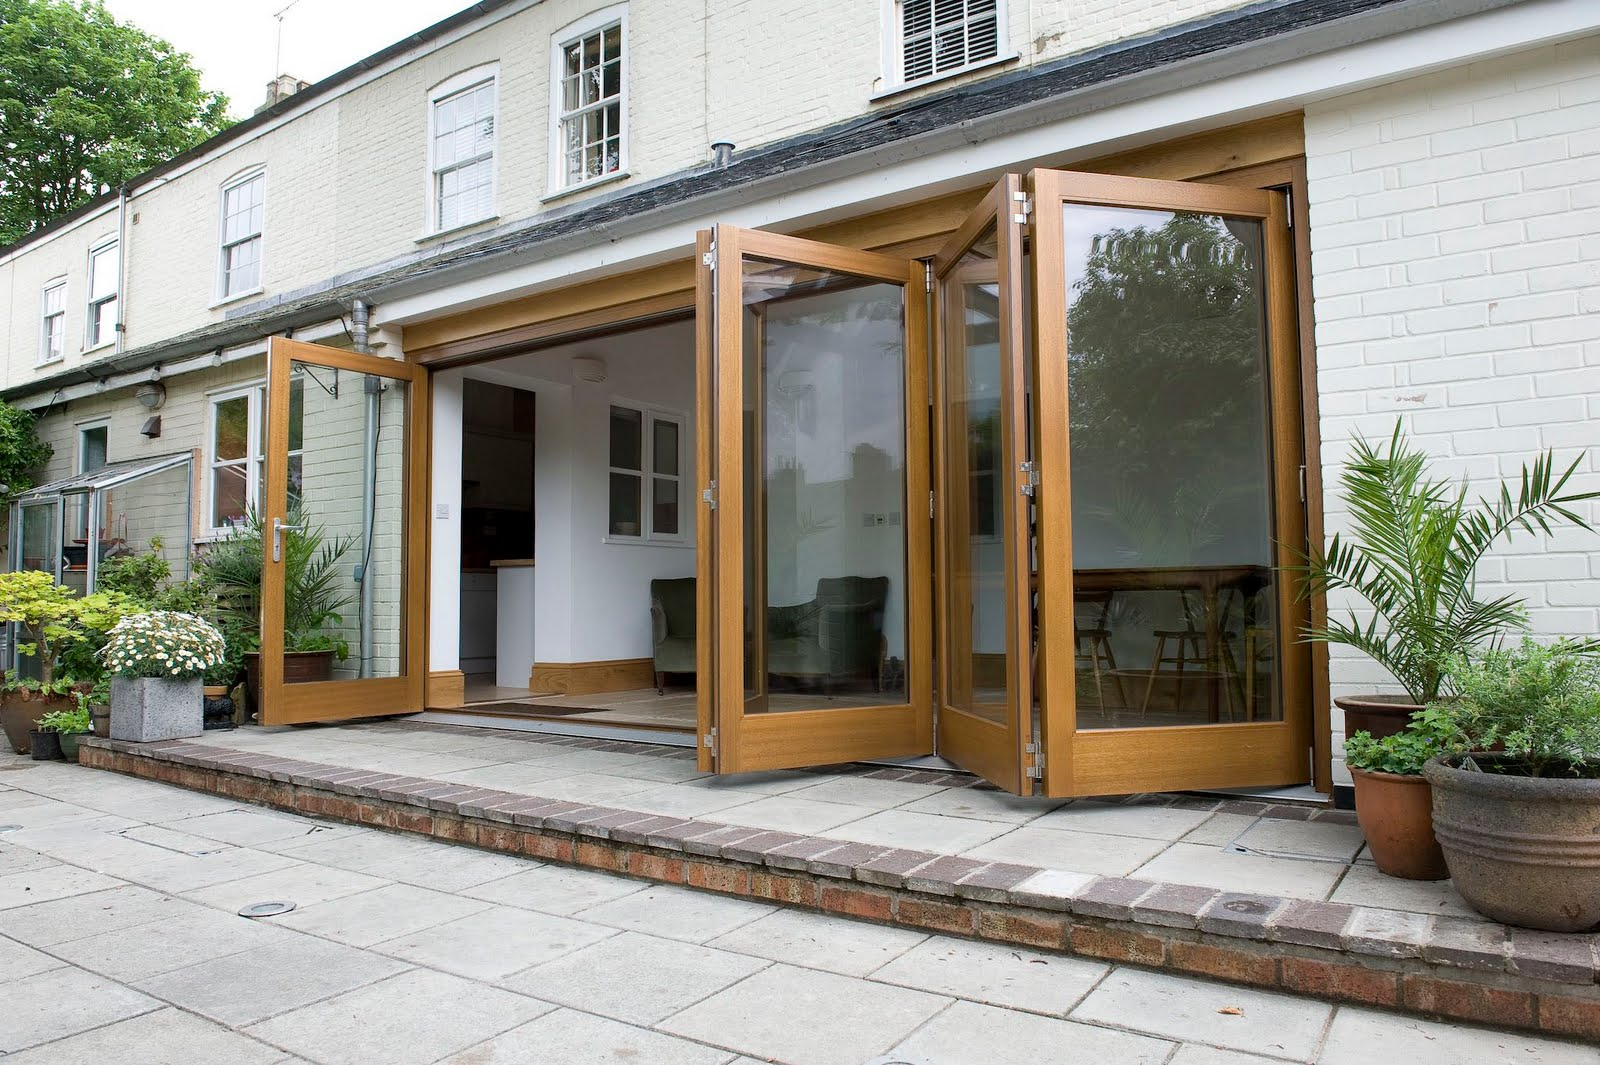 Tuesday 22 September 2009 & News from Broadland Windows